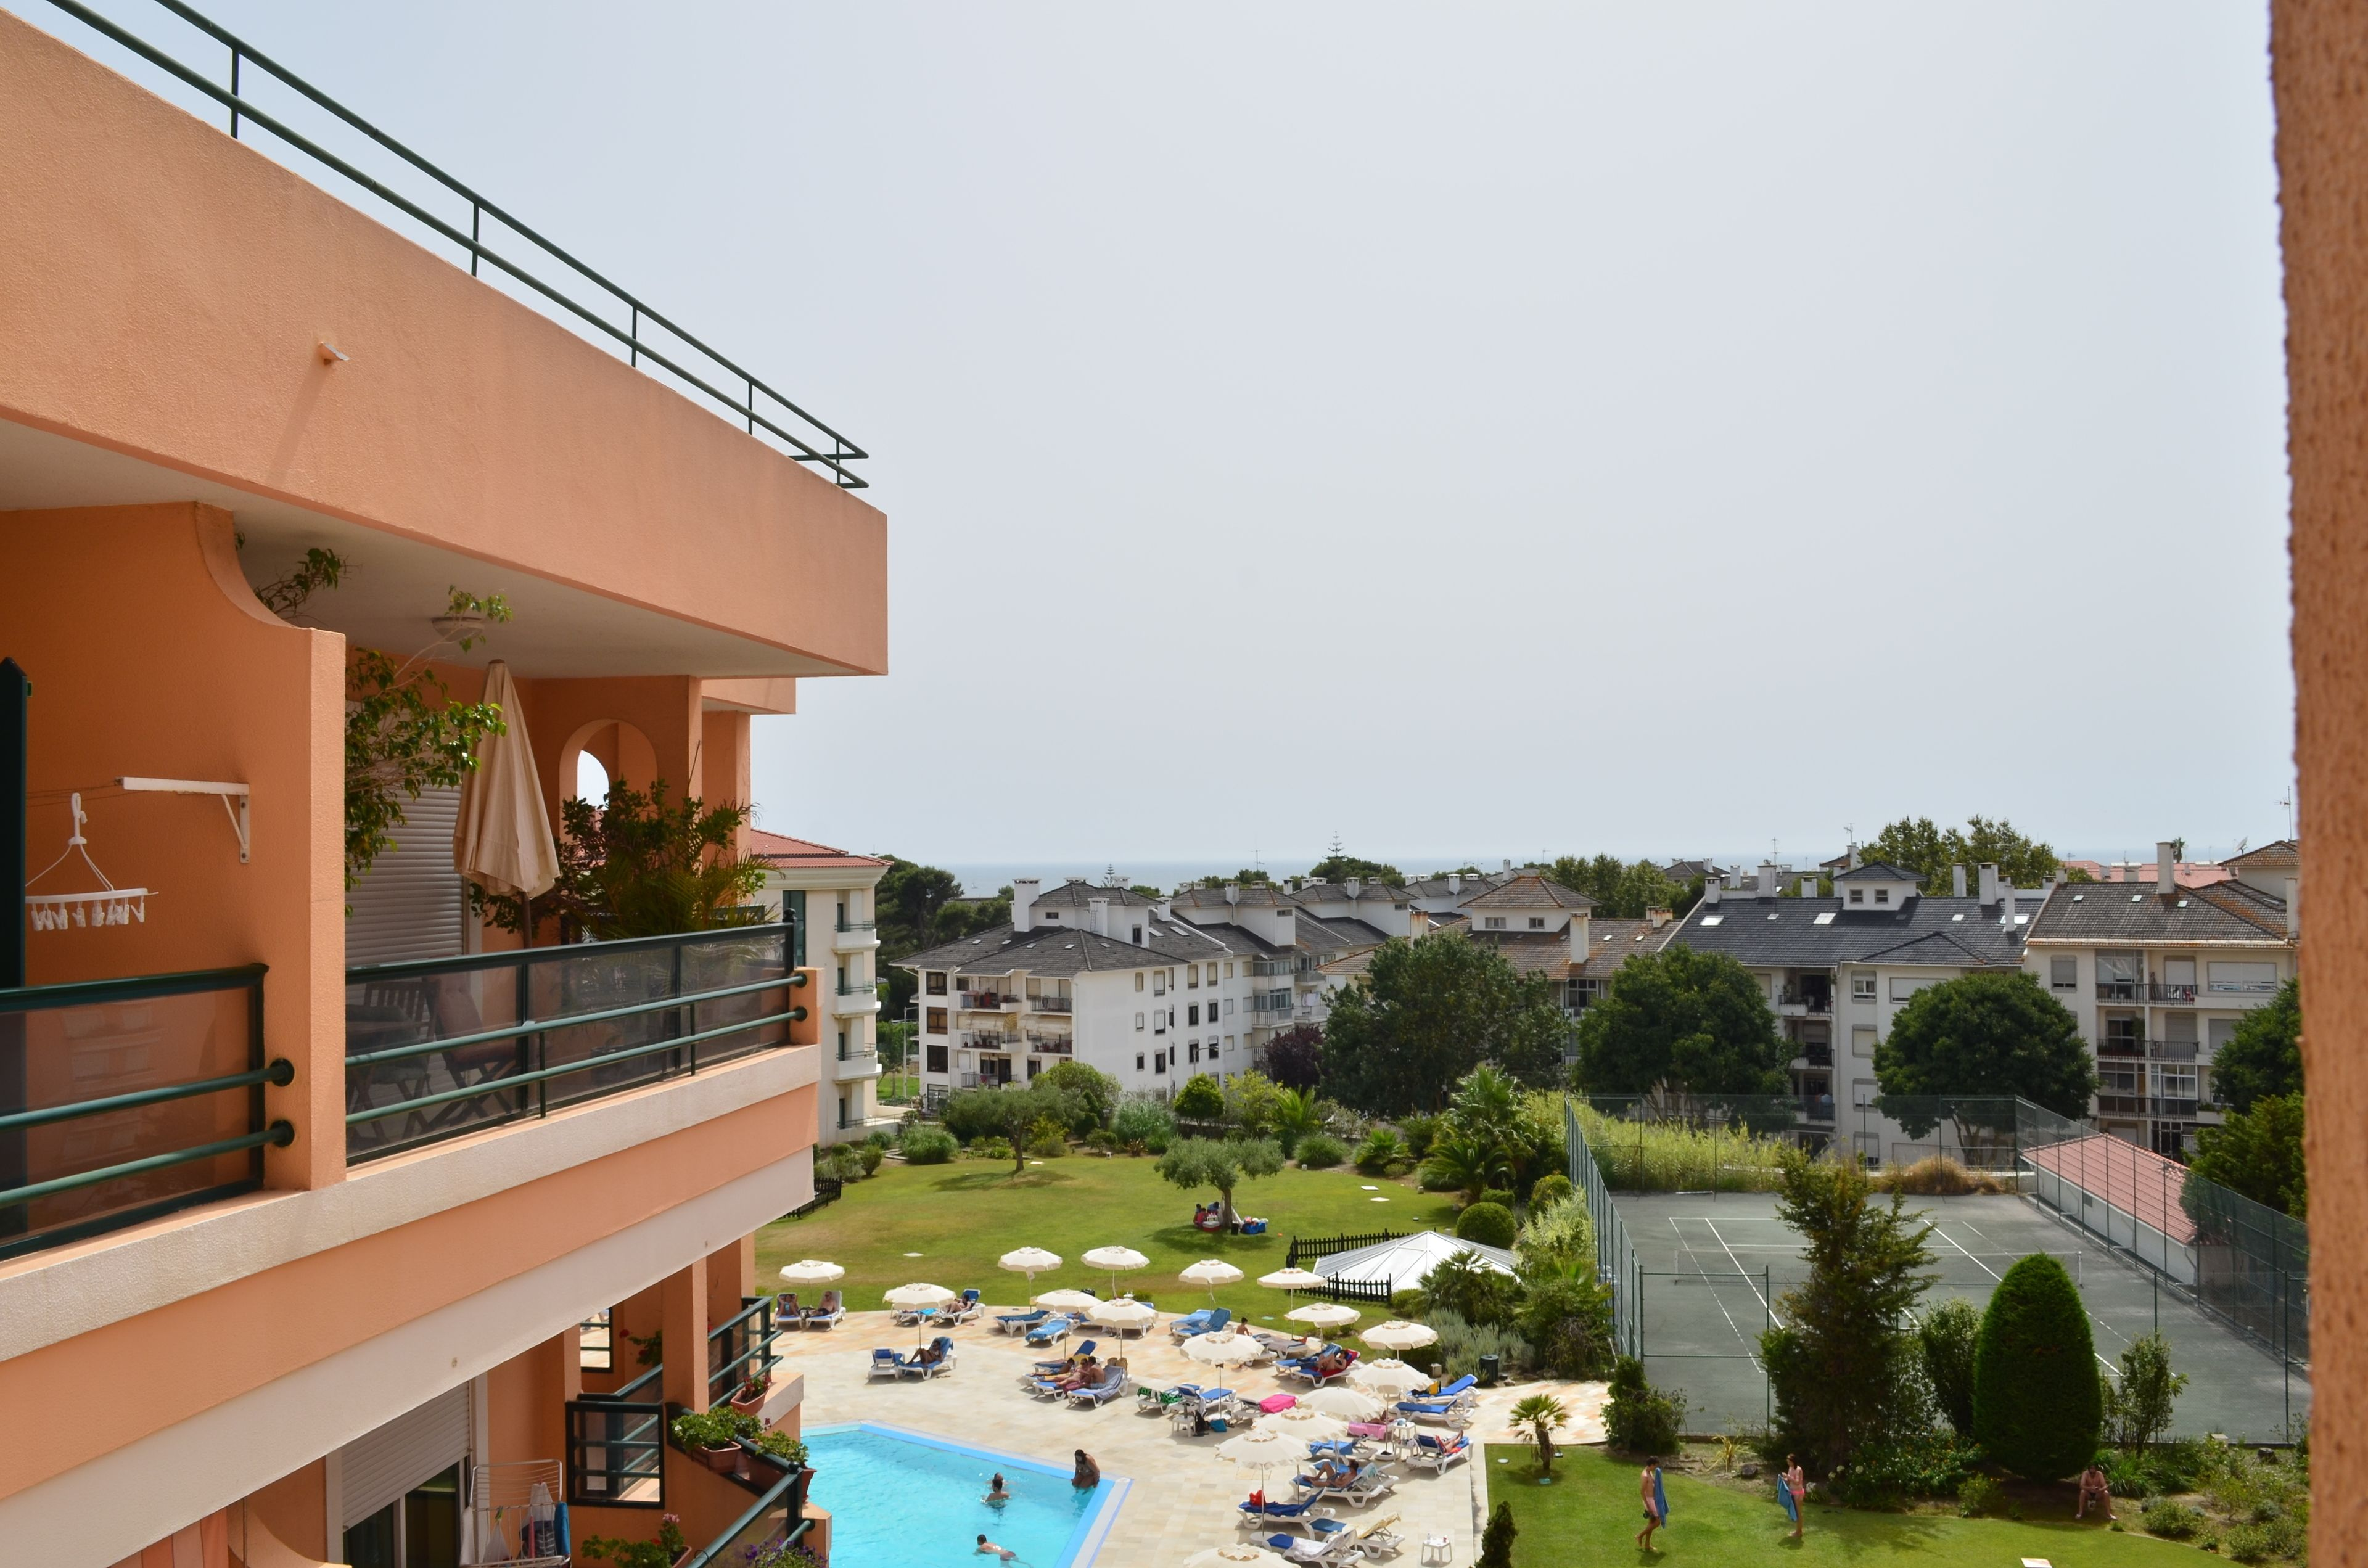 Cozy Apartment At Carcavelos Beach Precos Promocoes E Comentarios Expedia Com Br